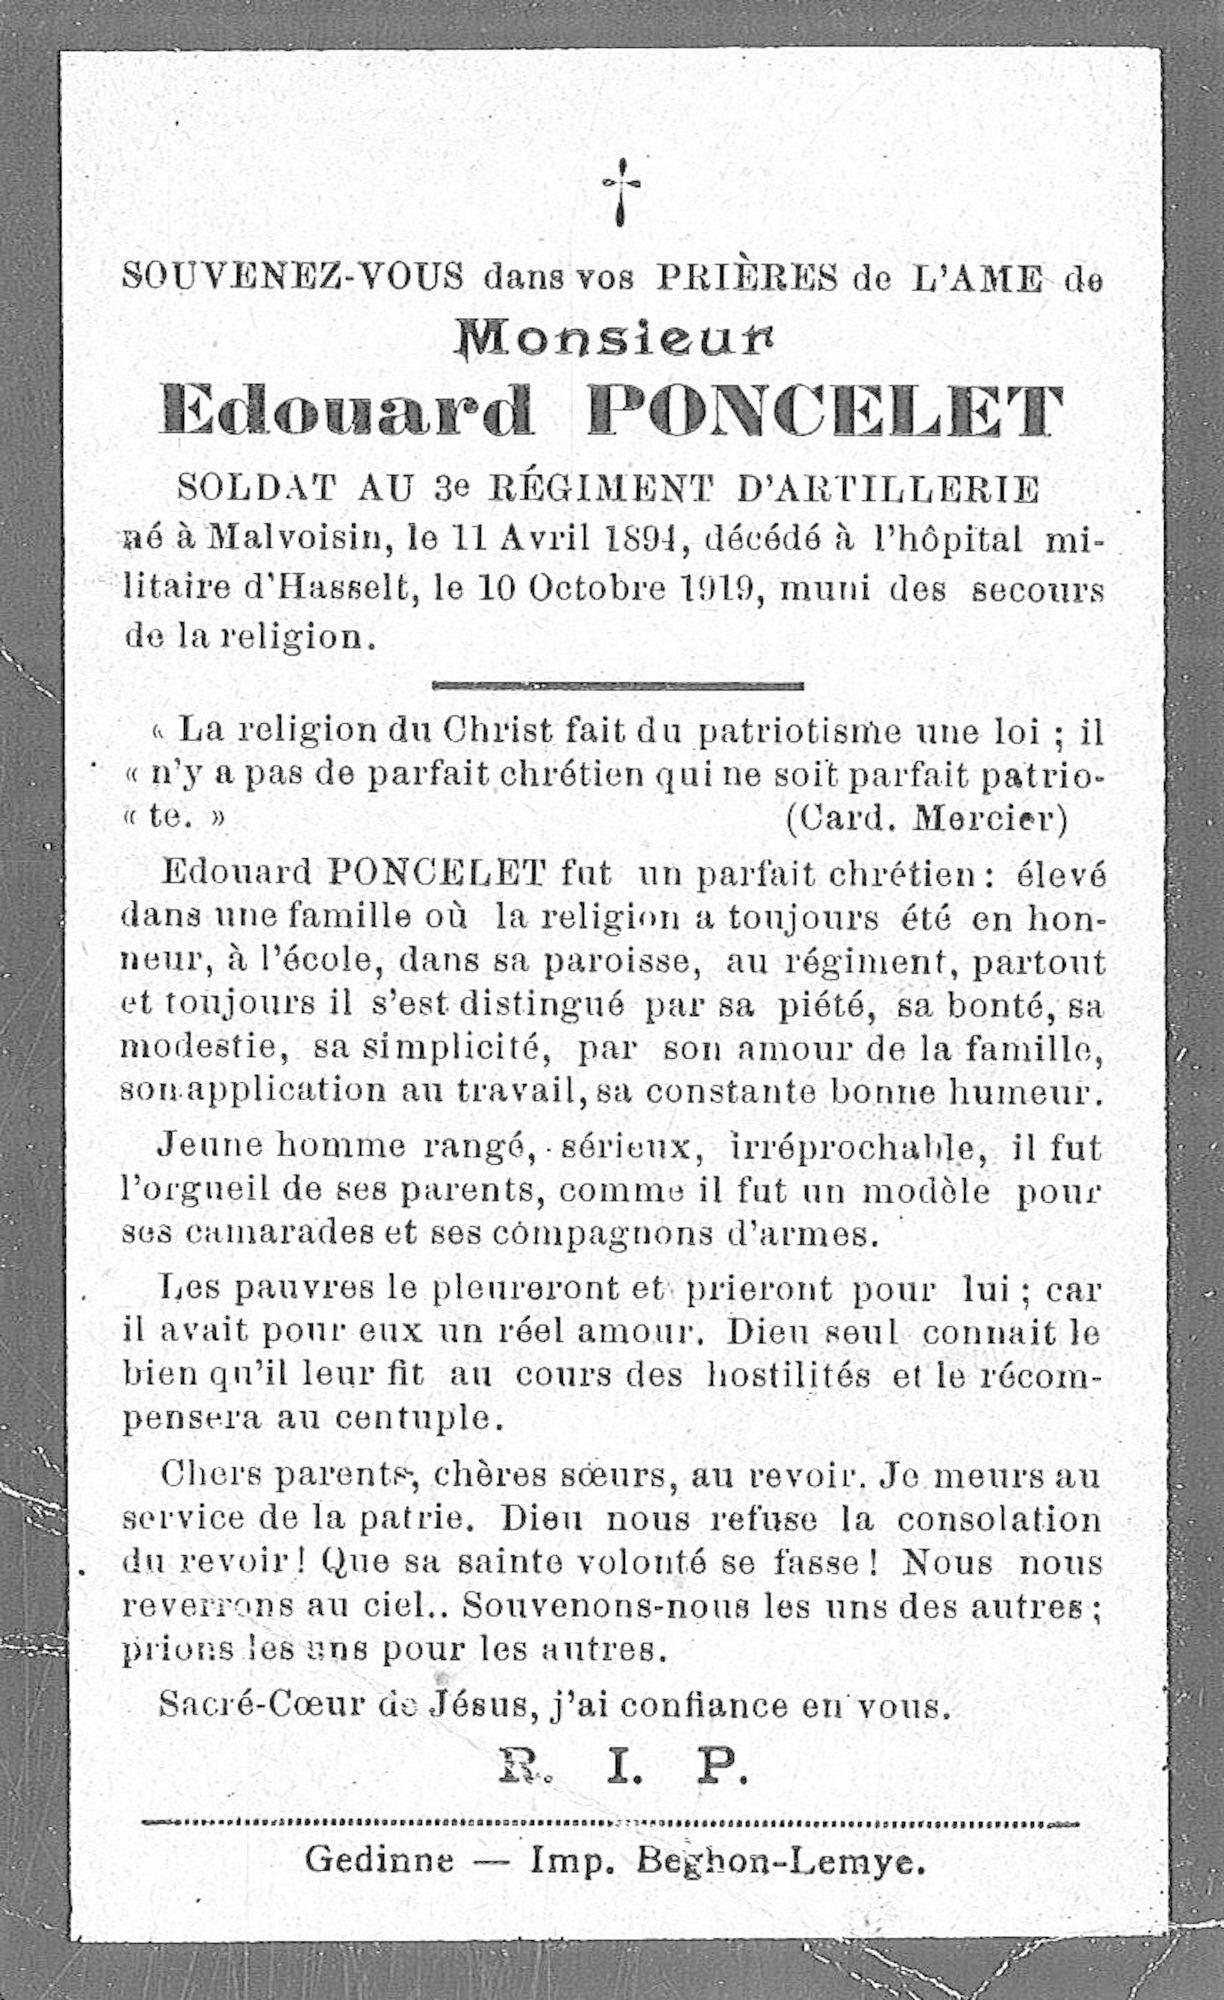 Edouard Poncelet